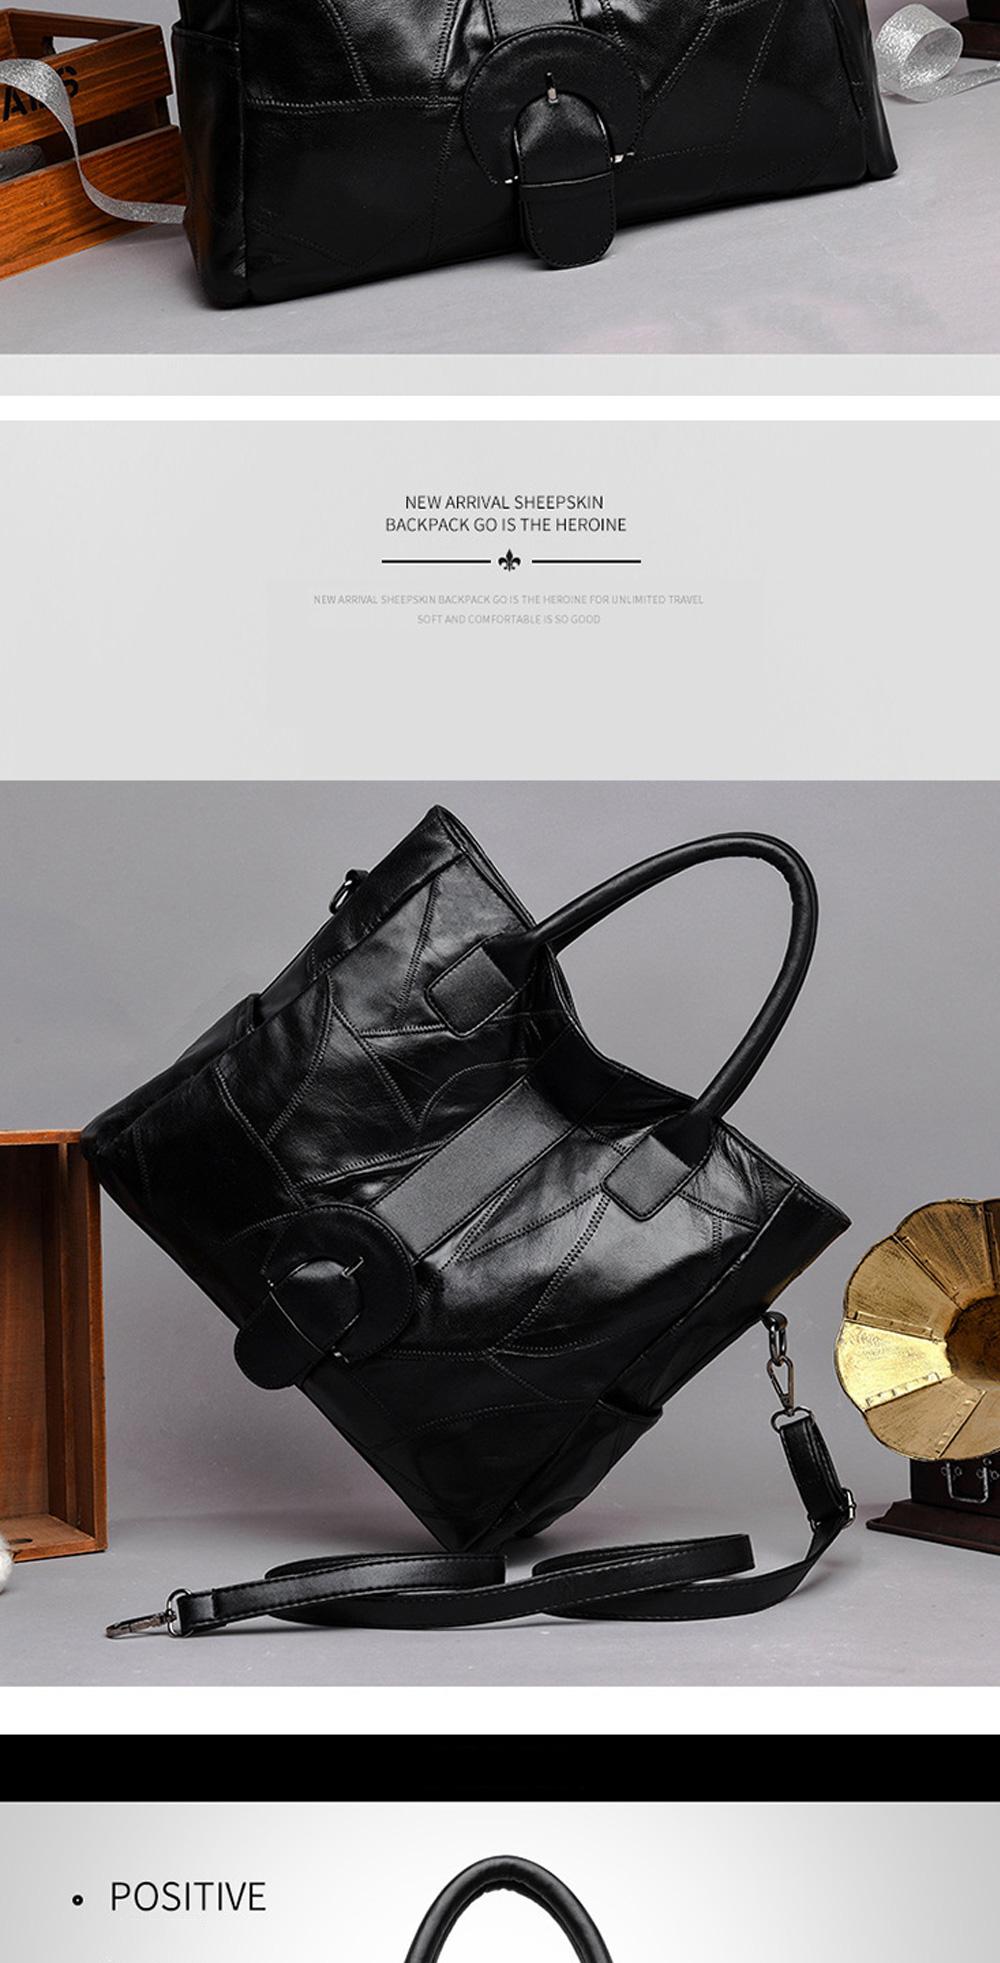 Genuine Leather Handbags Sheepskin Tote Bags, New Large-capacity Shoulder Handbags, Mommy bags Designed for women 33*10*31cm 4